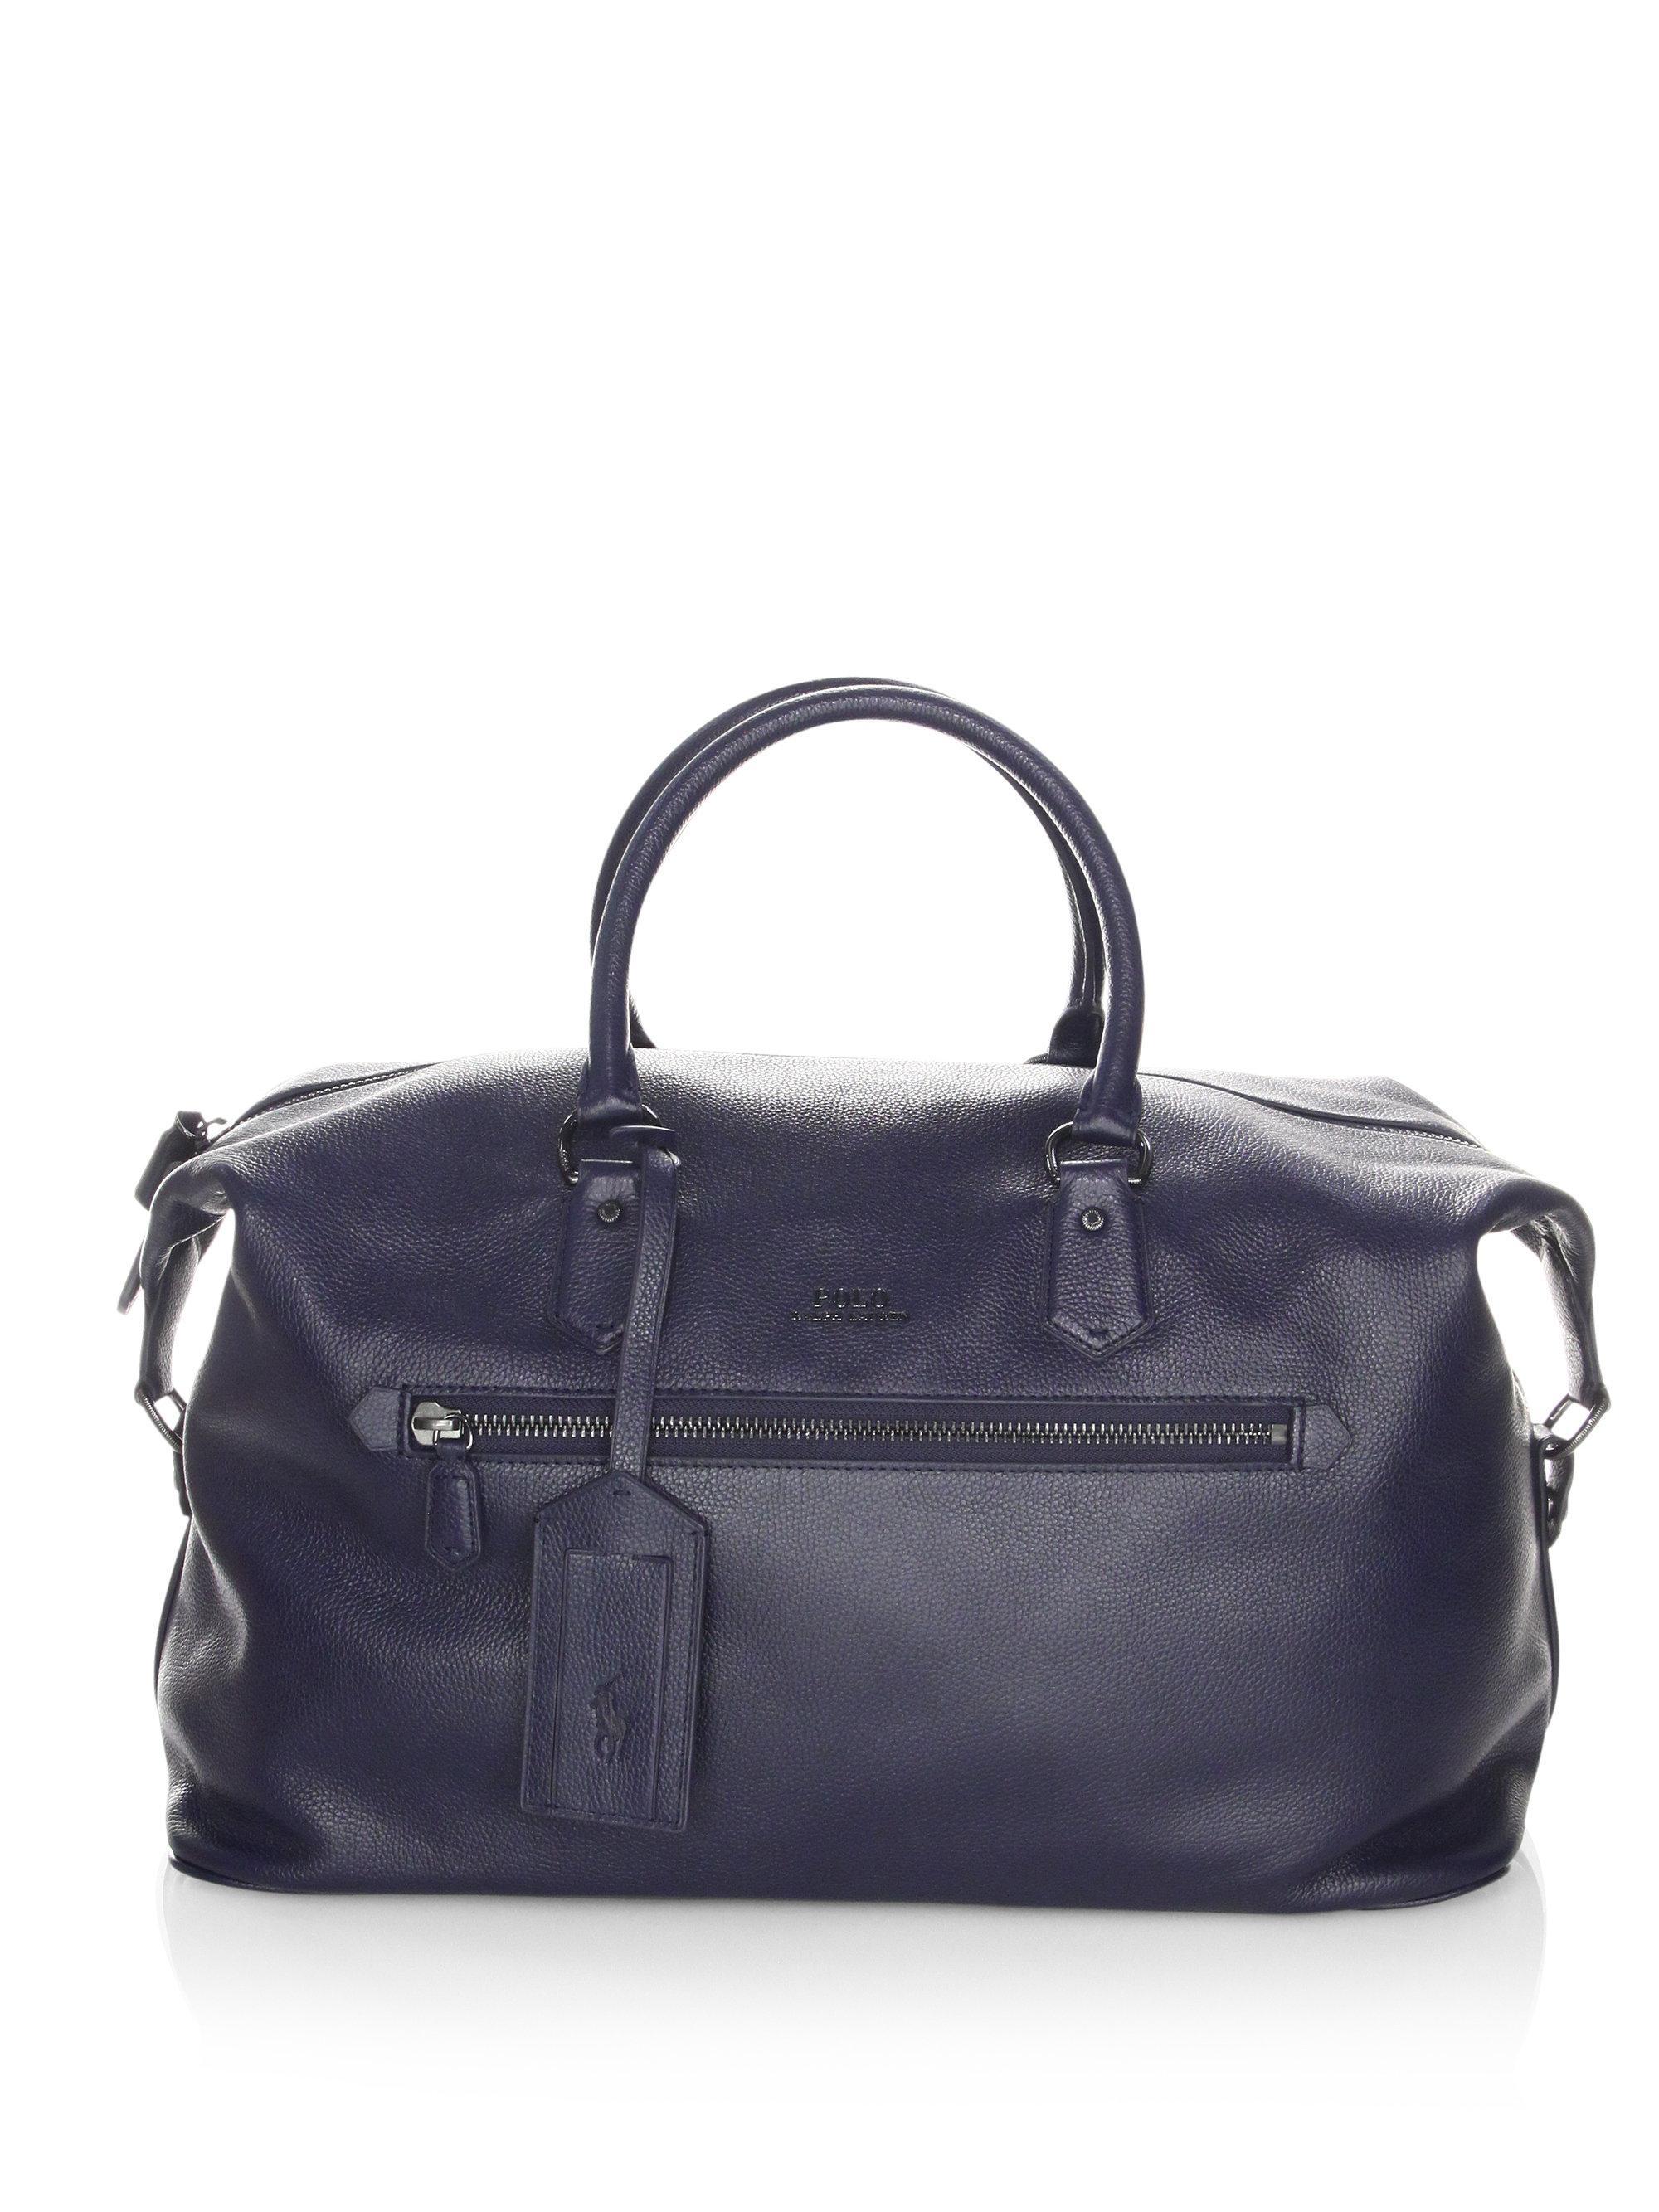 1b236b3c416 ... authentic polo ralph lauren. mens blue pebbled leather duffle bag 449db  7a00f